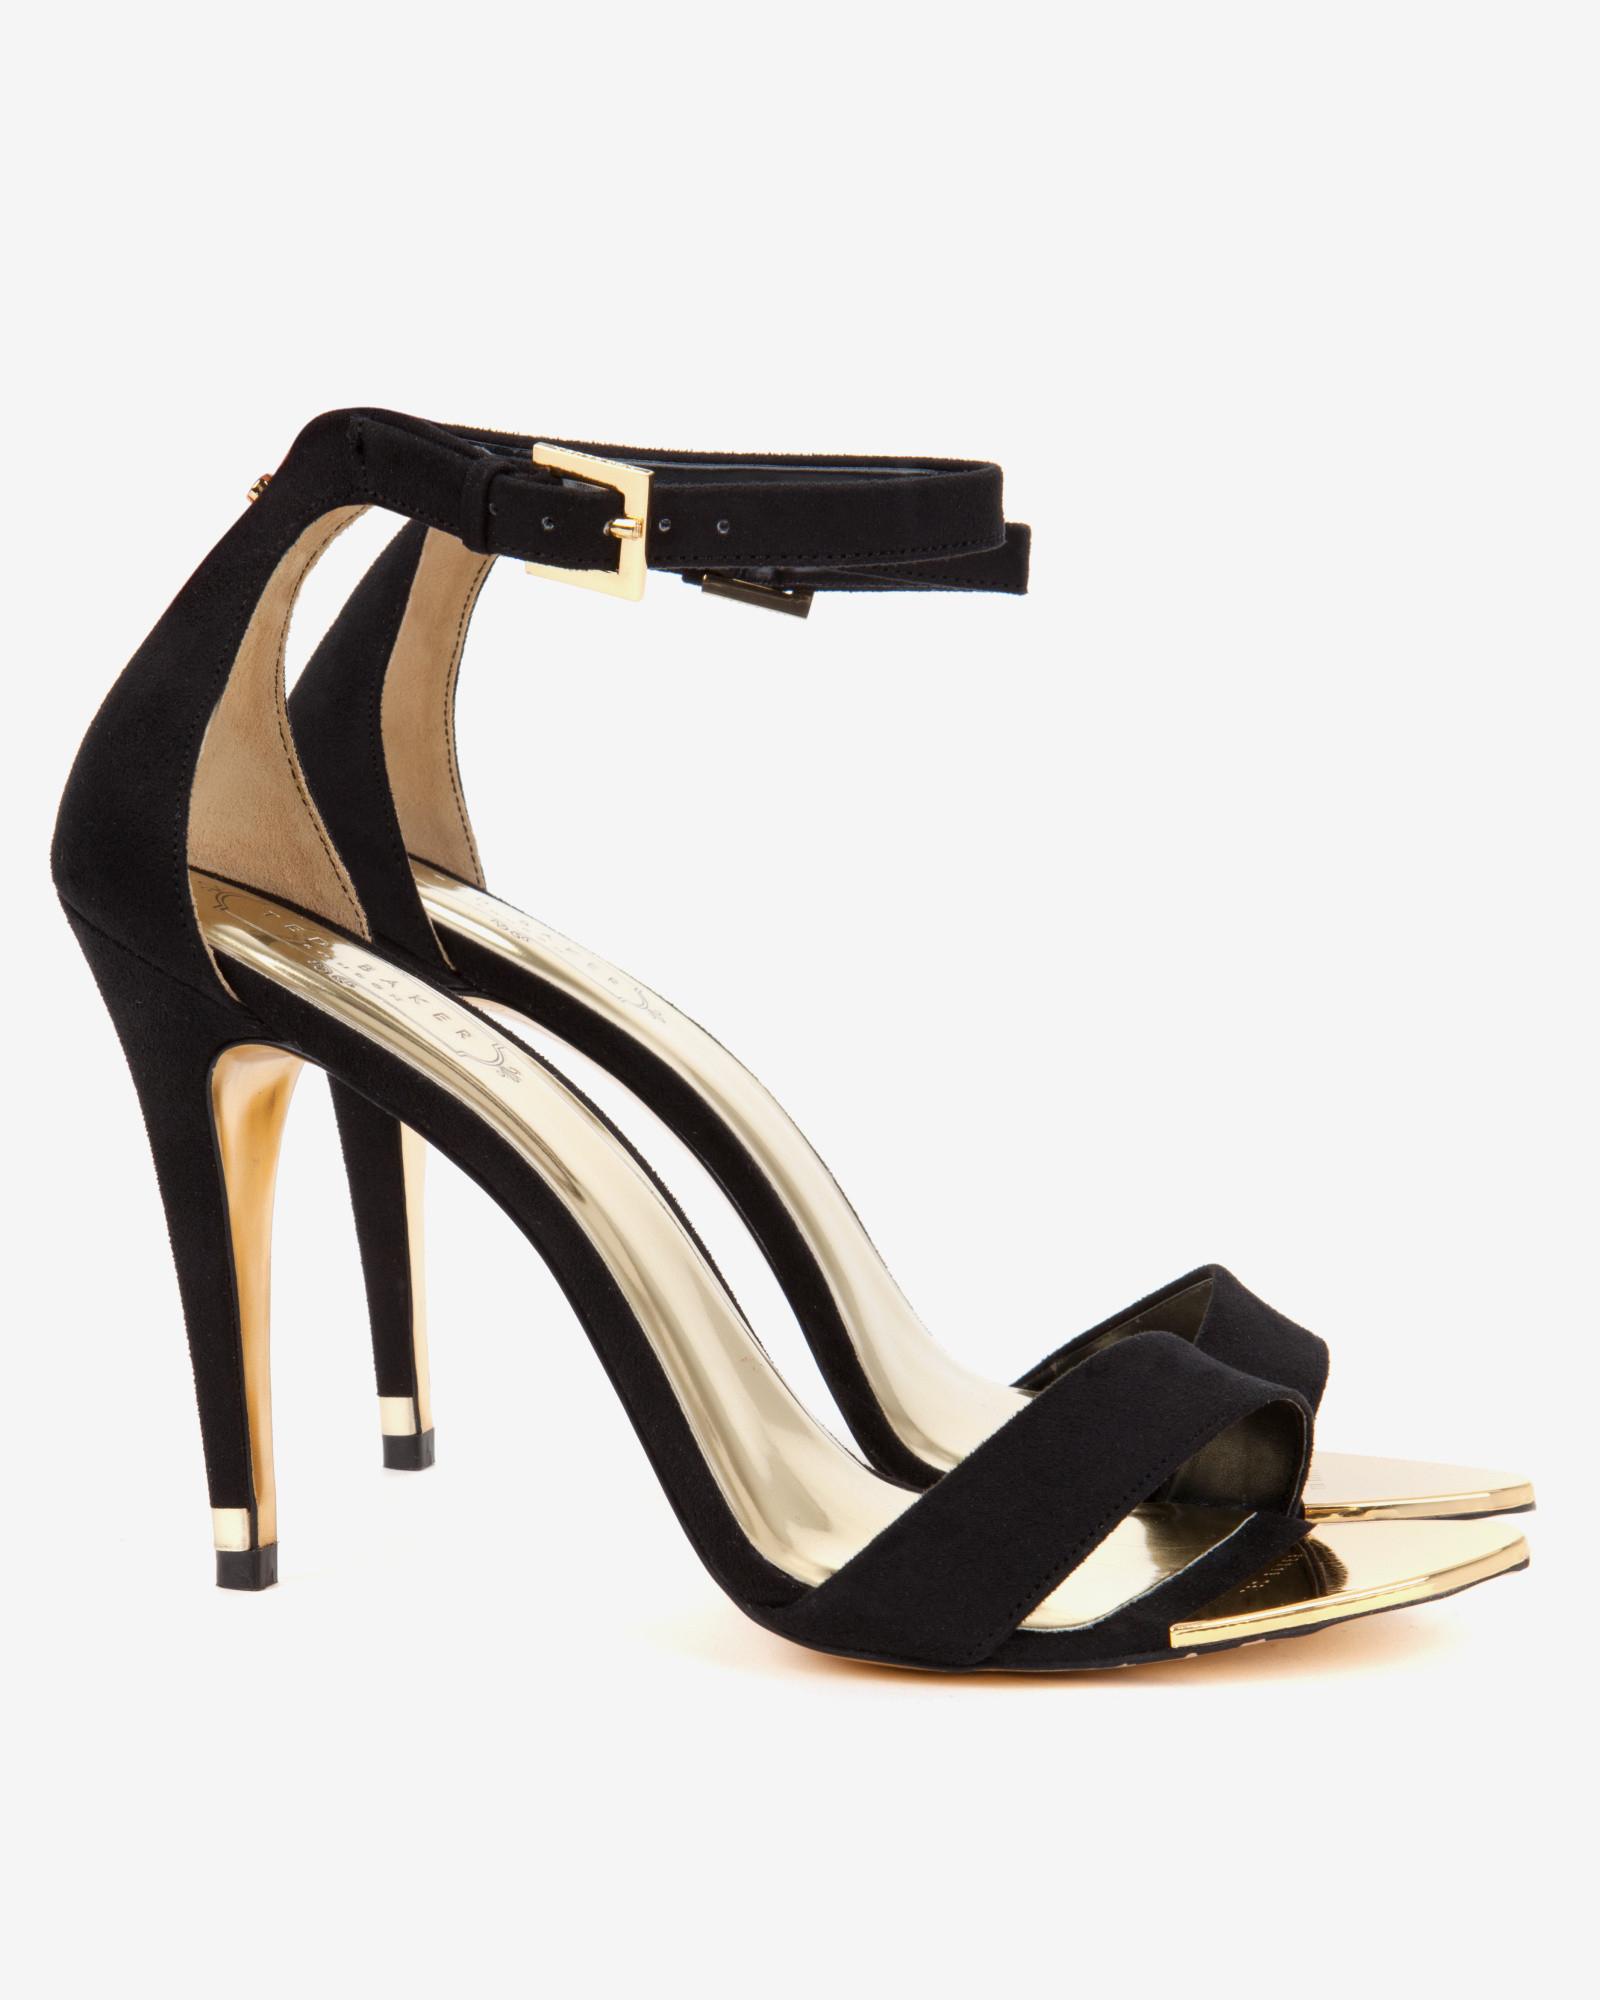 7d64287d91b Lyst - Ted Baker Ankle Strap Sandals in Black